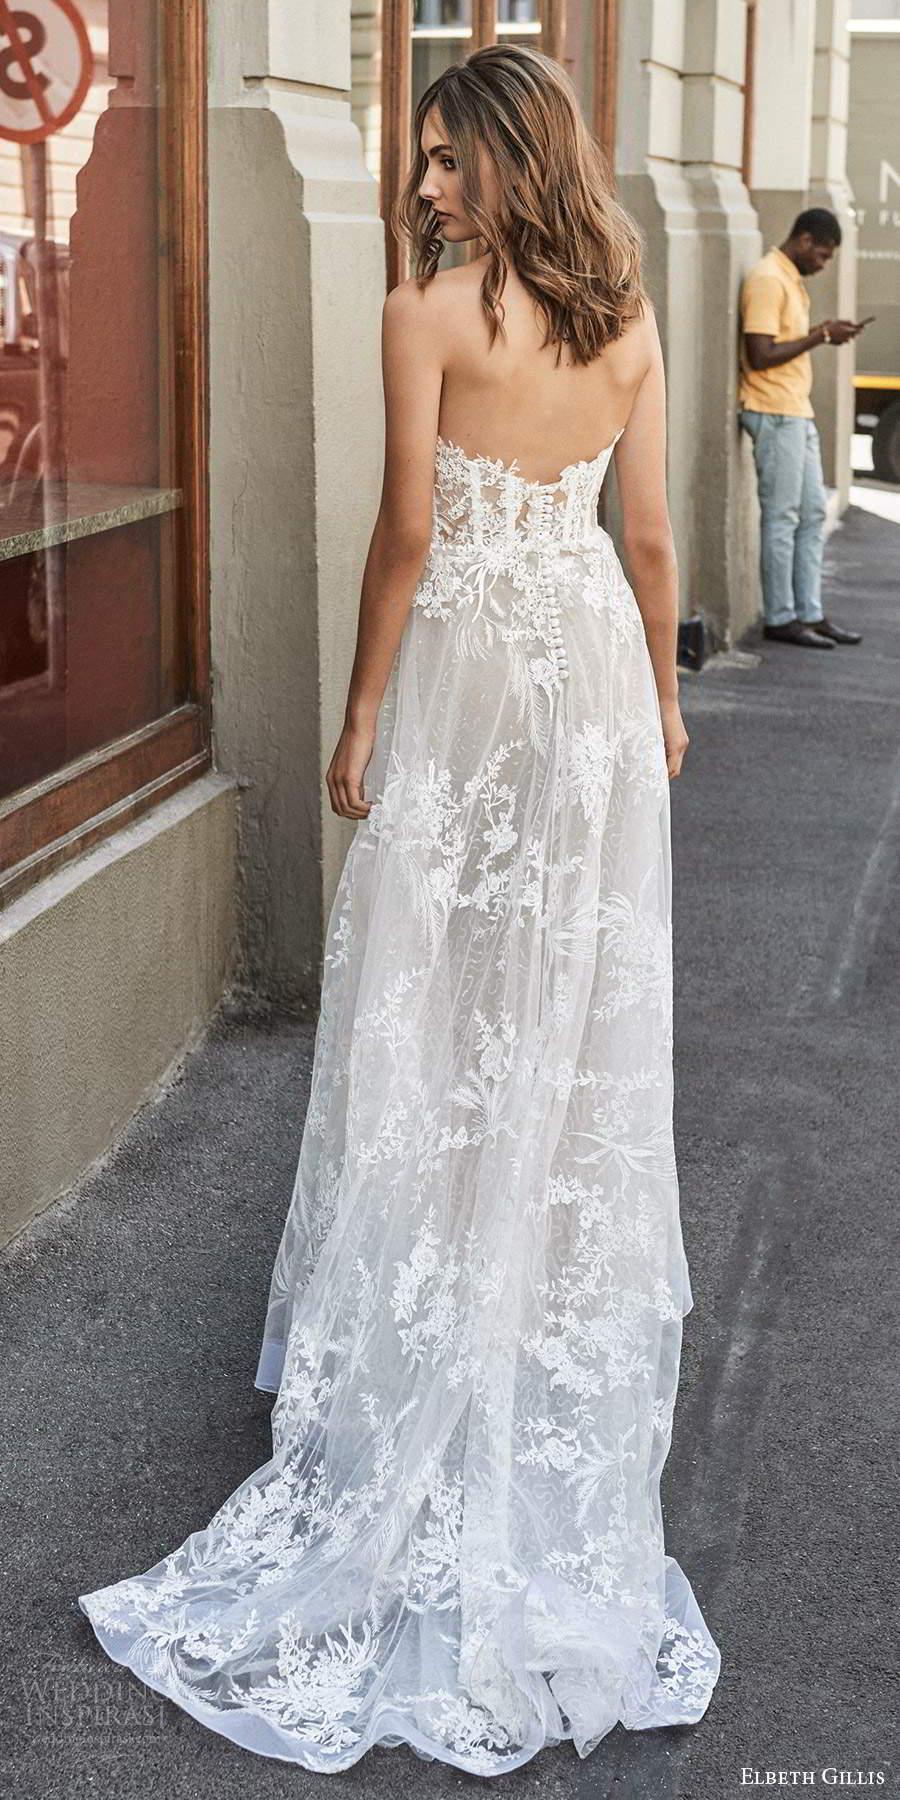 elbeth gillis 2021 bridal strapless sweetheart neckline embellished lace a line ball gown wedding dress chapel train (4) bv